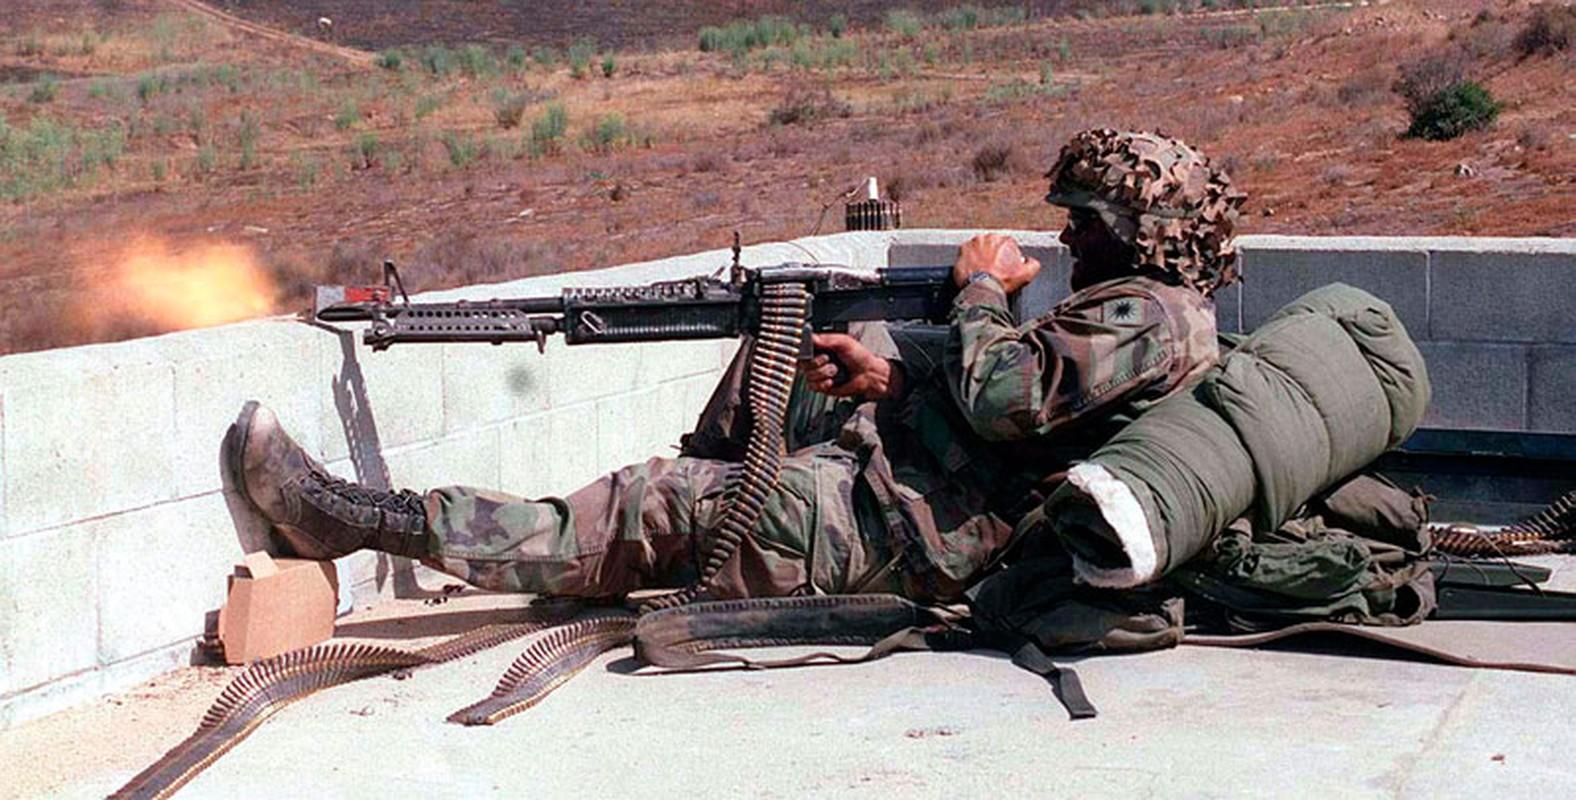 Tai sao Viet Nam nen dung lau dai sung may M60 My?-Hinh-6